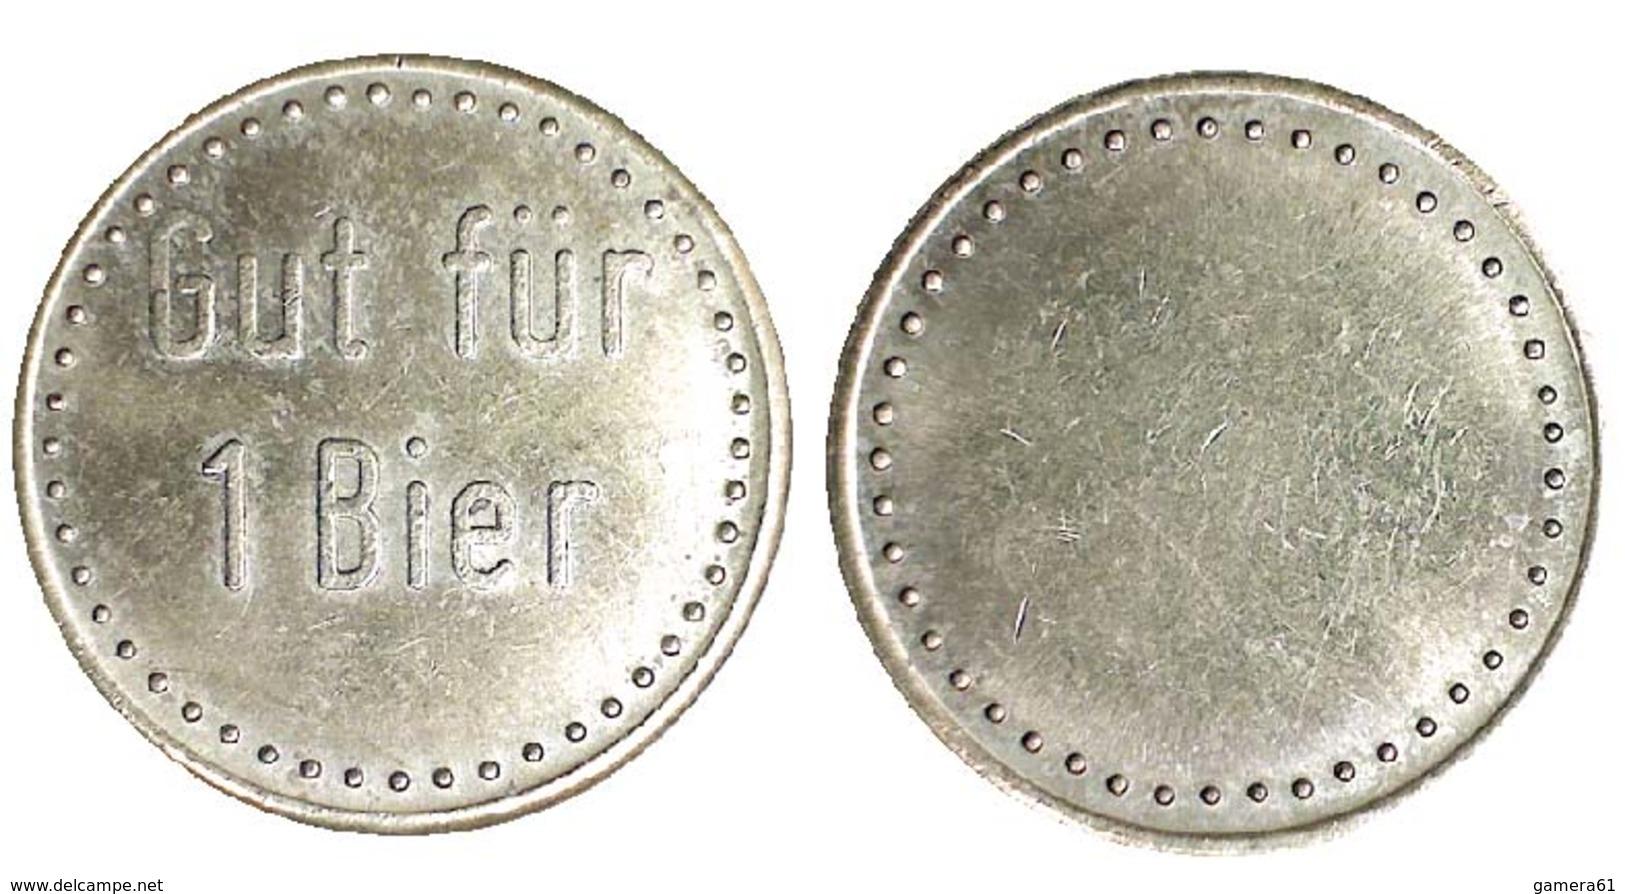 05236 GETTONE TOKEN JETON VENDING KANTINE BIER GUT FUR 1 BIER BRASS - Allemagne